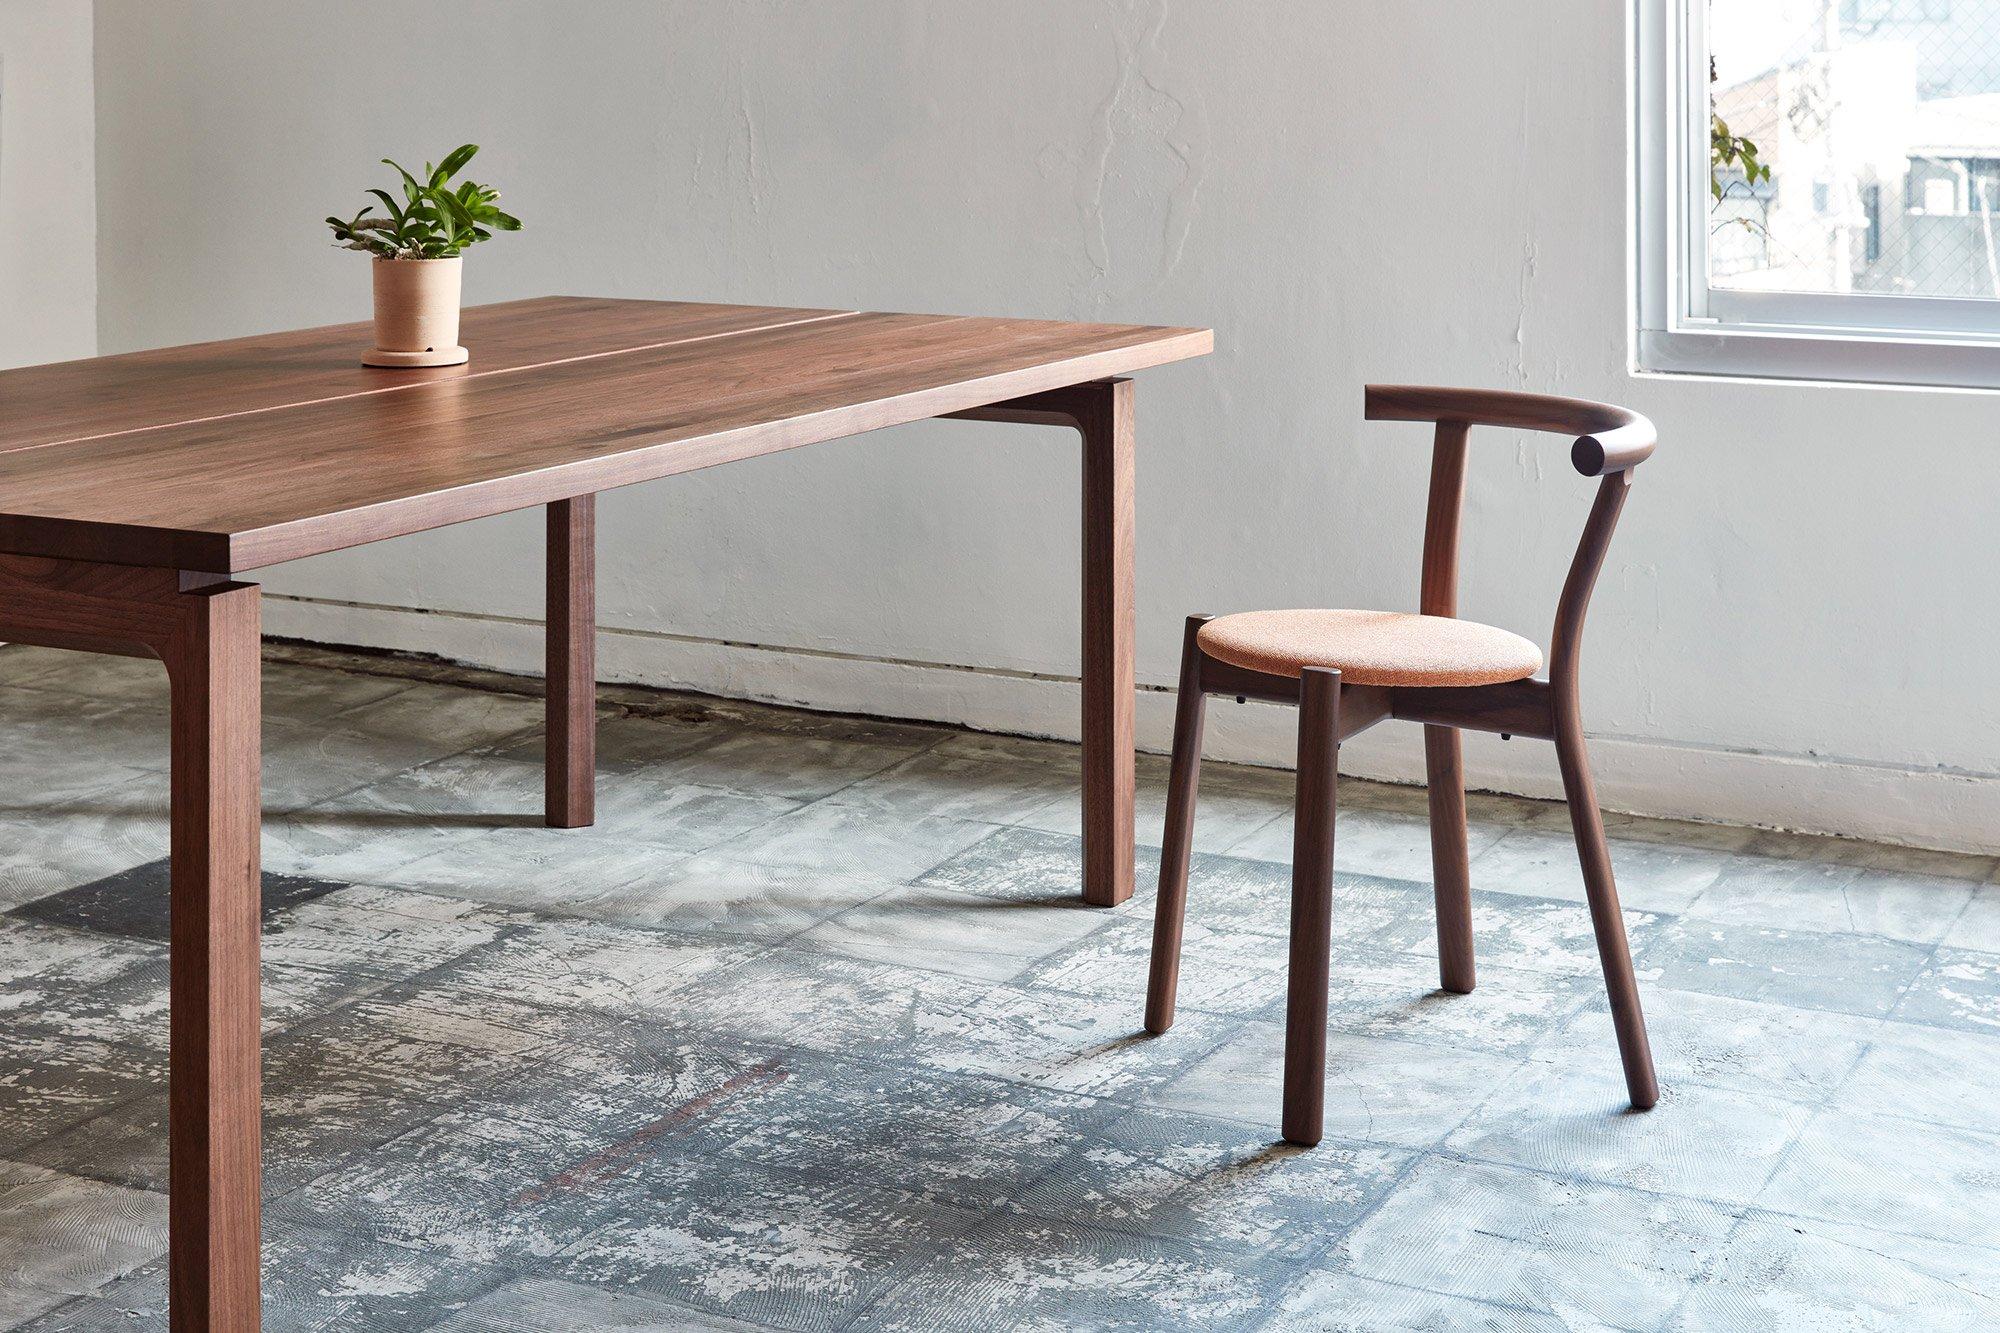 Introducing The Taiyouu0026C Furniture Brand